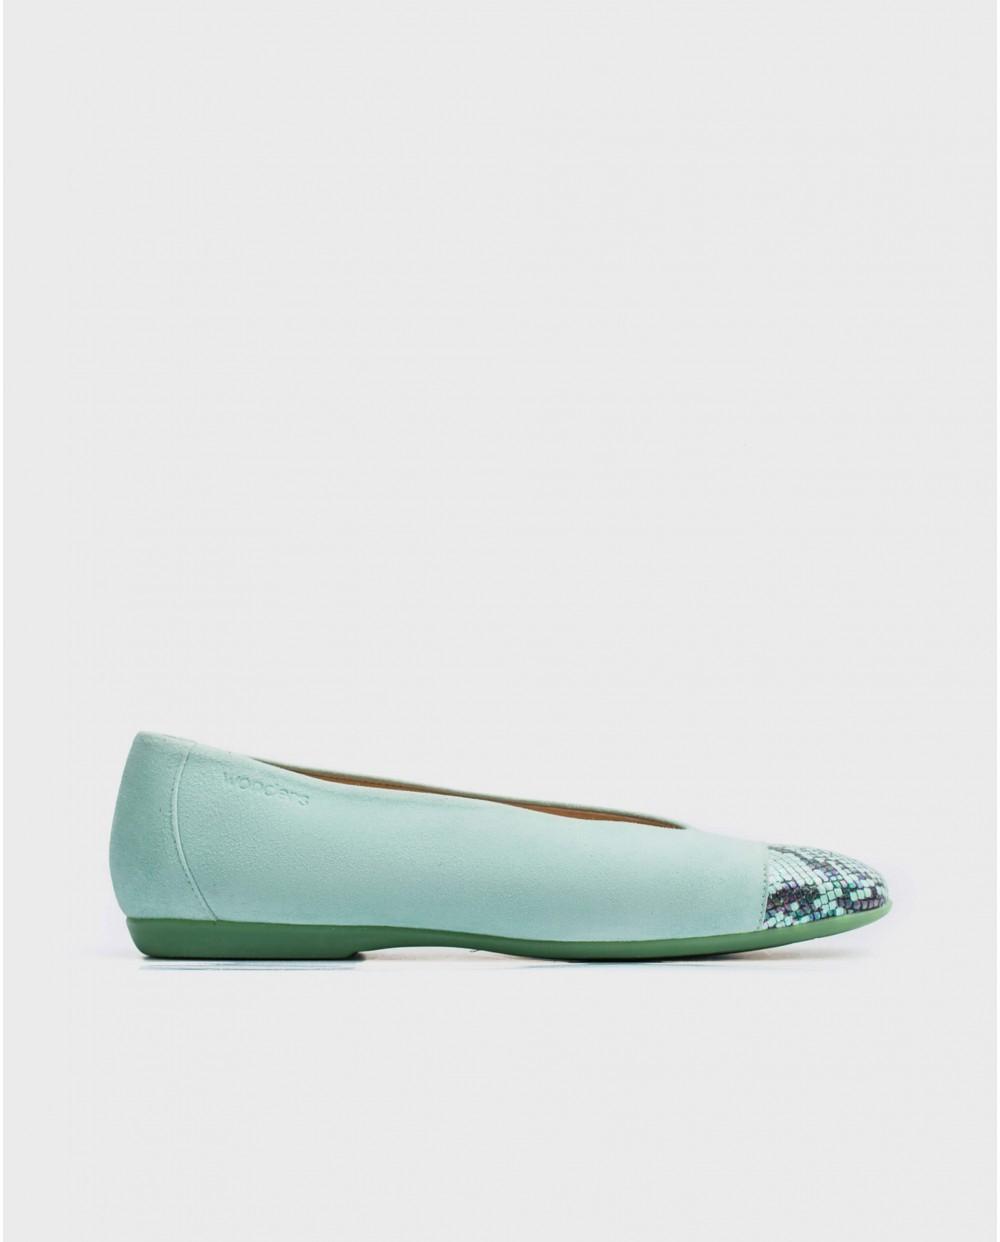 Wonders-Flat Shoes-Snake print ballet pump